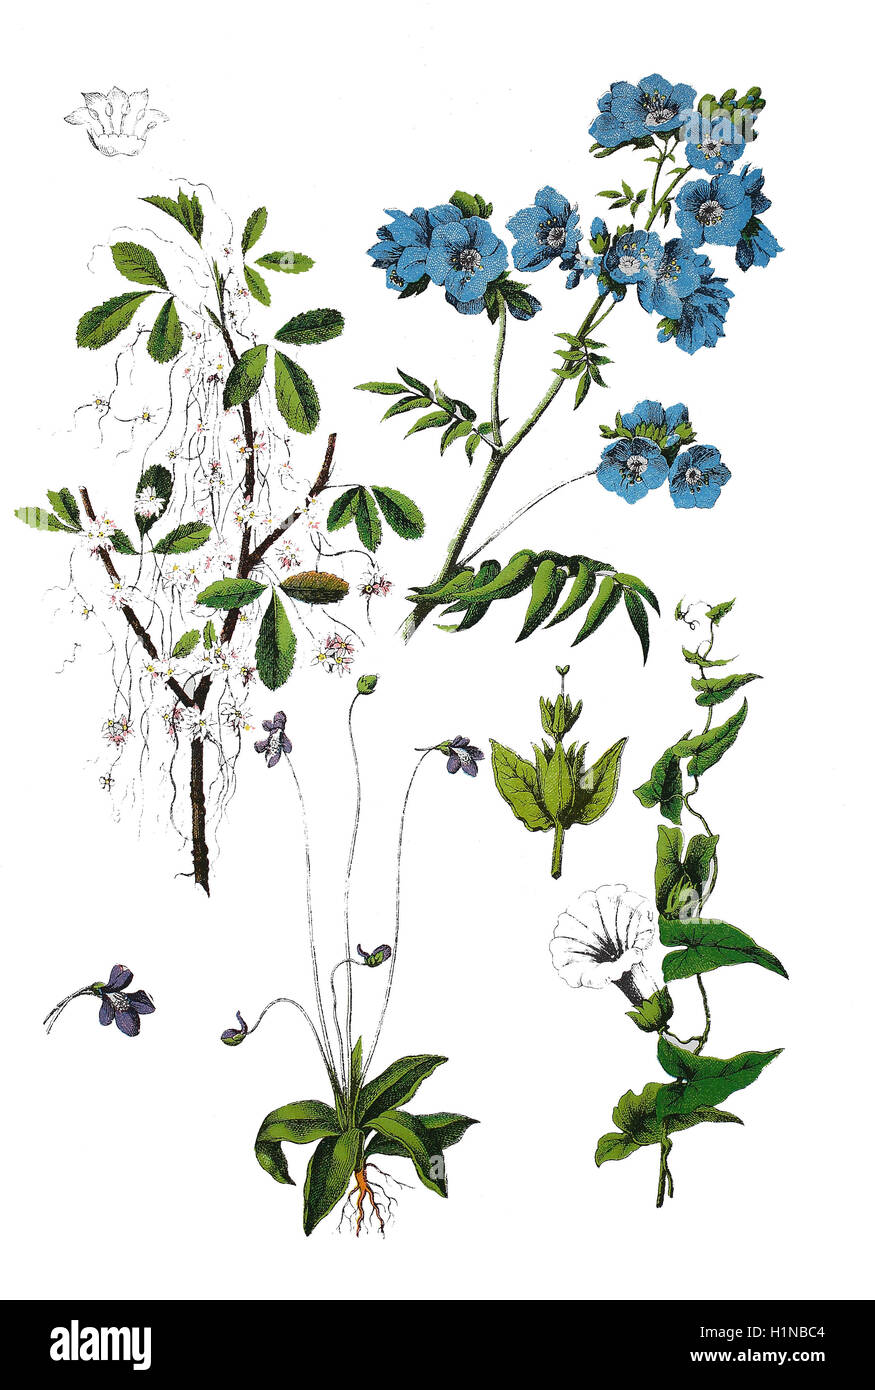 Dodder, Hellweed, Strangle-tare, Cuscuta epithymum (top left), Jacob's-ladder, Polemonium caeruleum (top right), - Stock Image